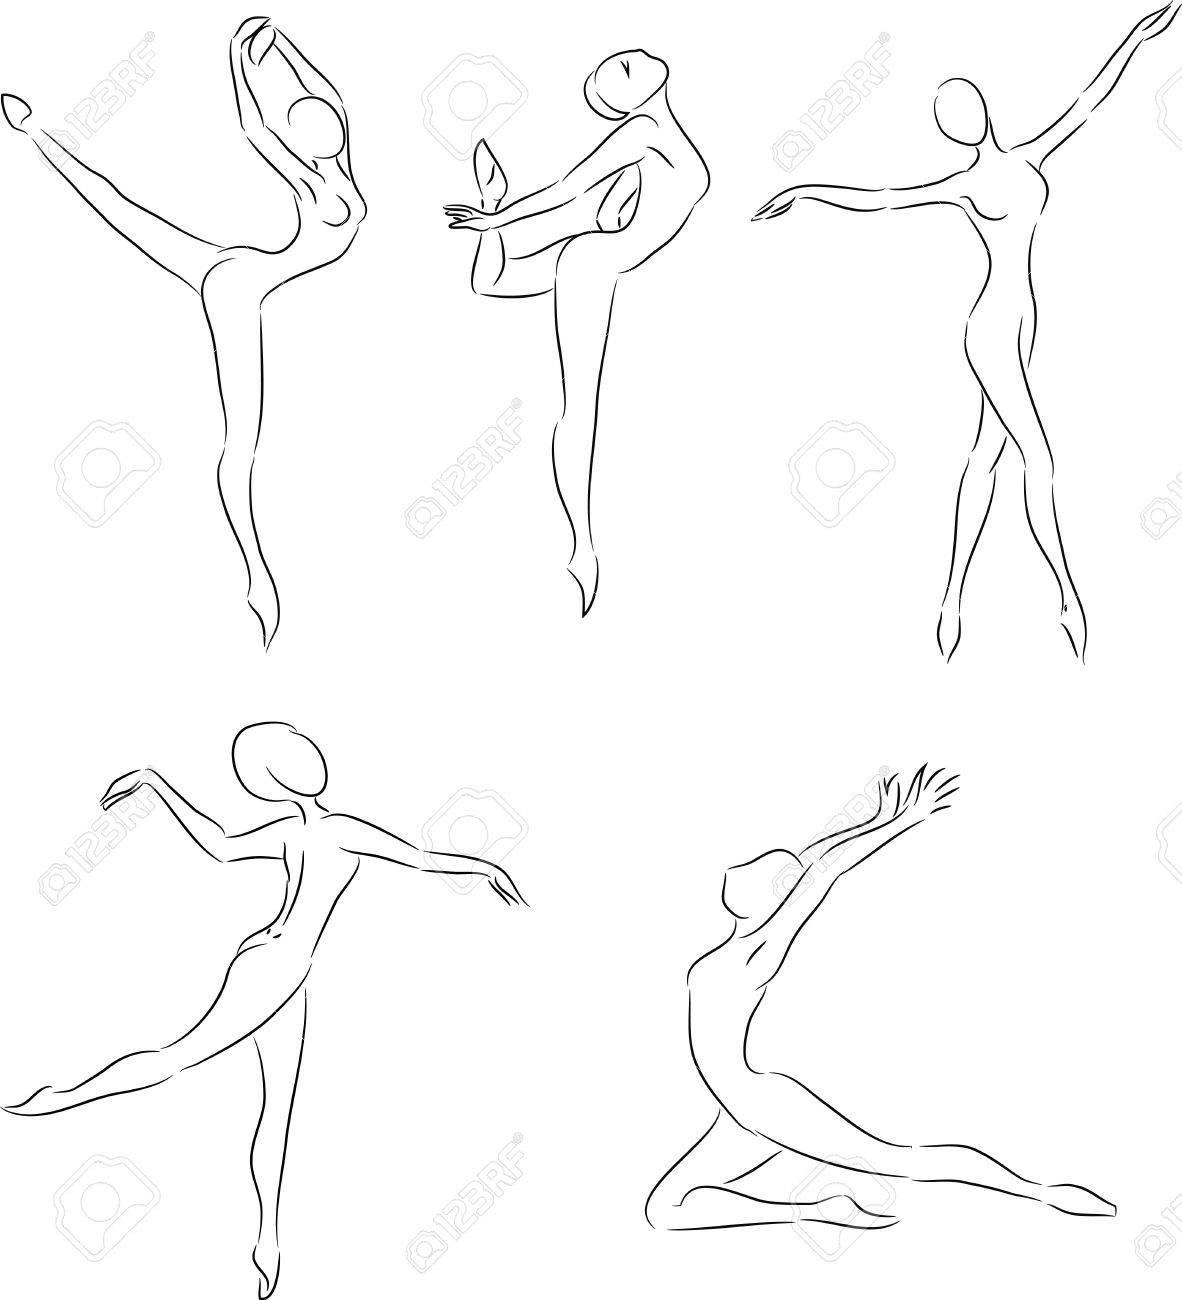 Ballerina Poses Drawing At Getdrawings